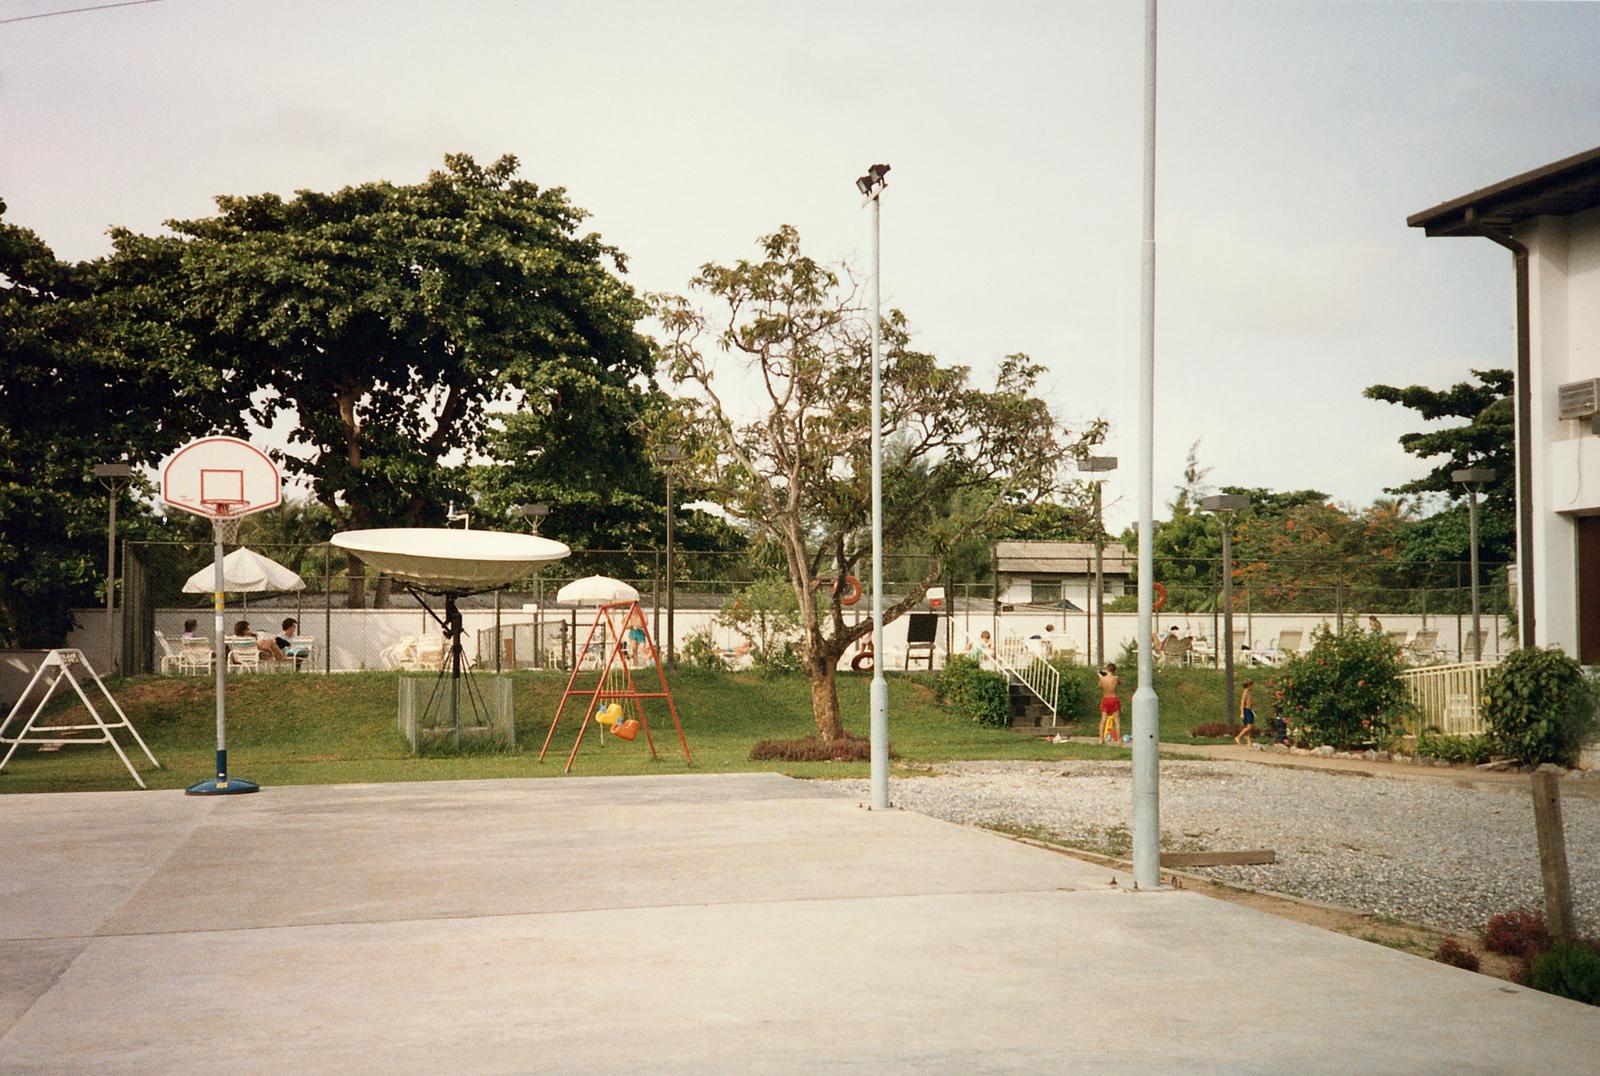 Lagos - Recreation/Community Center/Gym/Theater - 1989